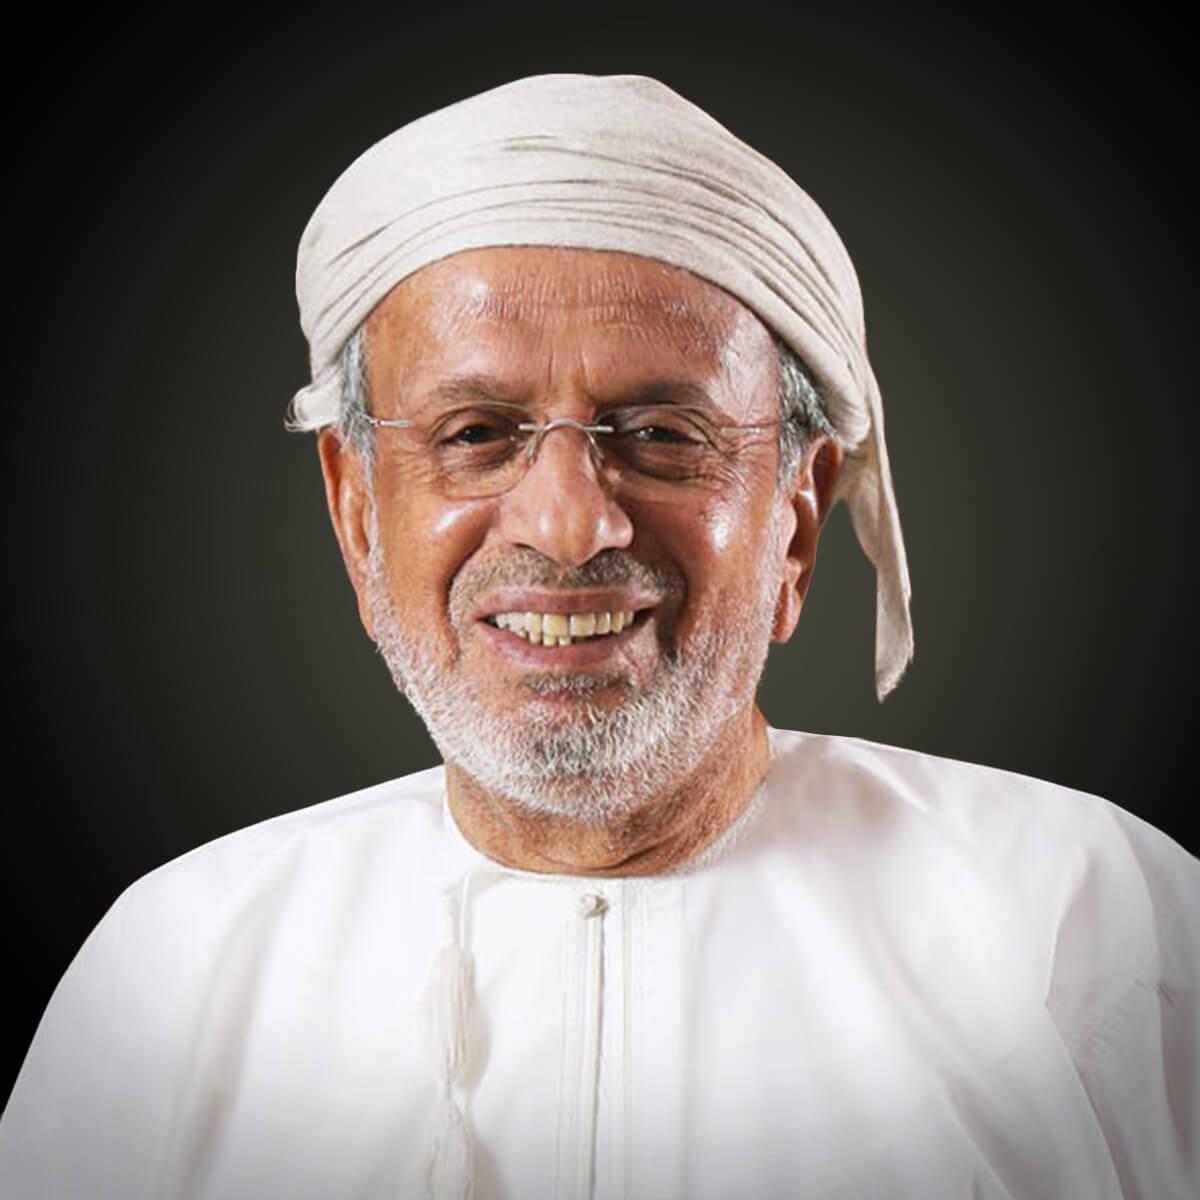 Suhail Bahwan